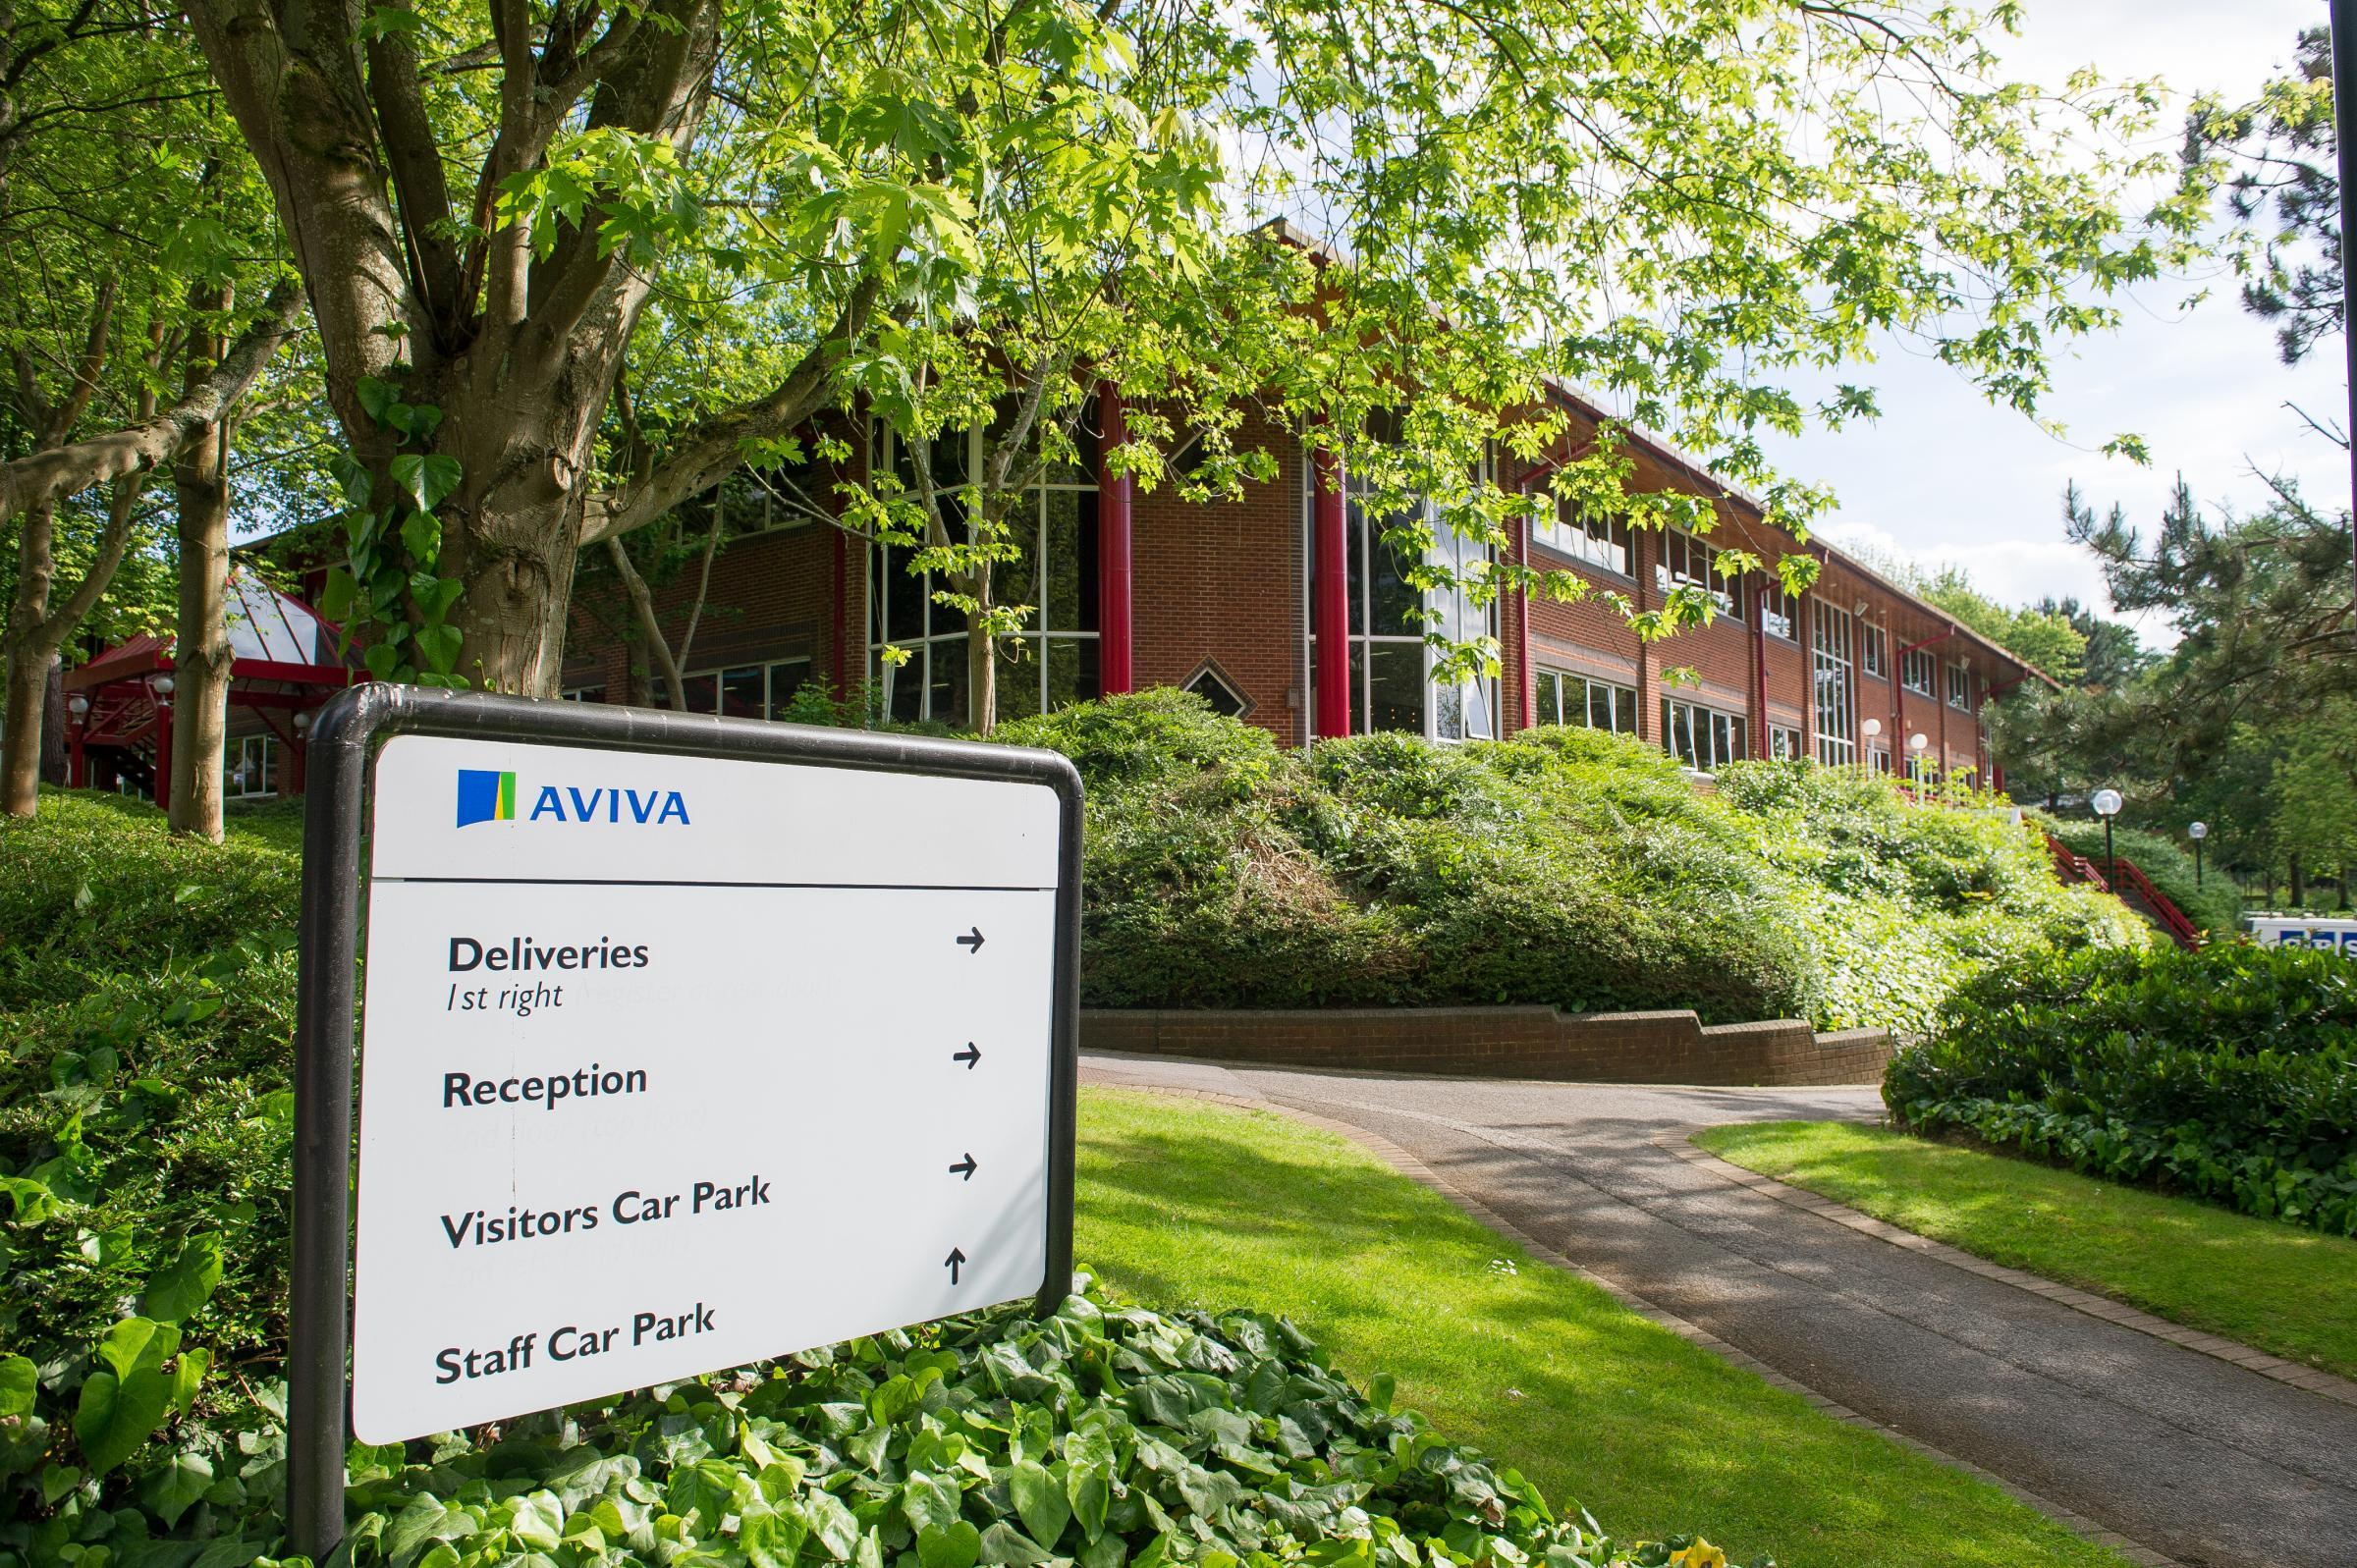 Uncertainty Over Future Of Jobs In Aviva Office Closure